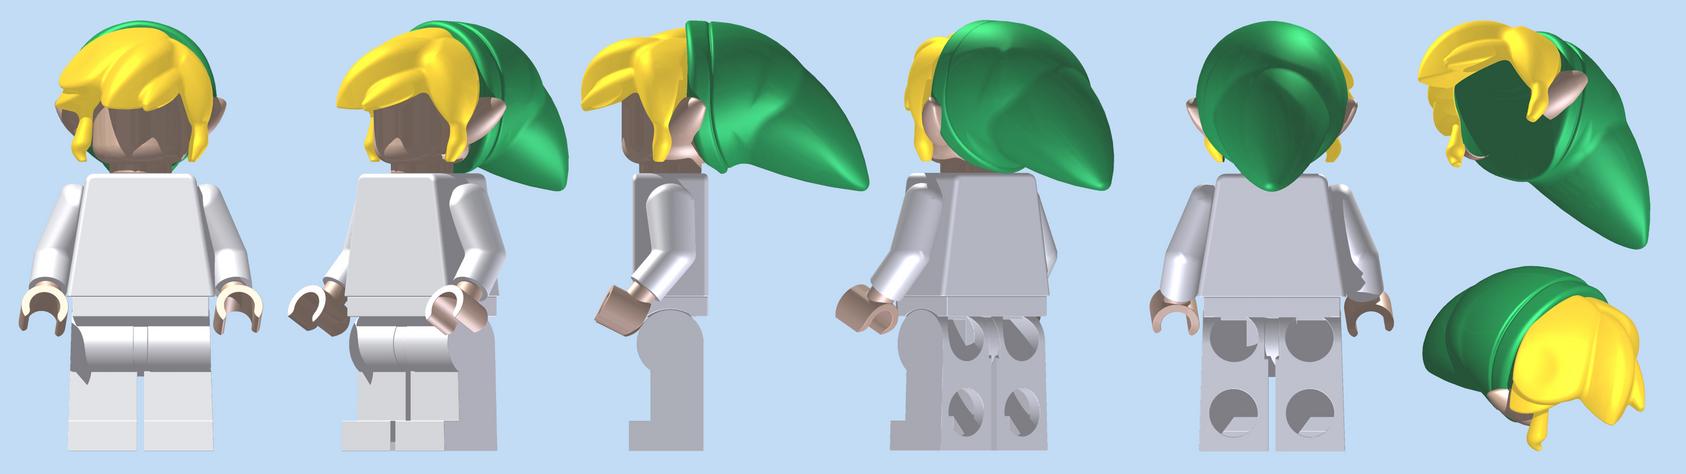 LEGO Toon Headpiece by mingles